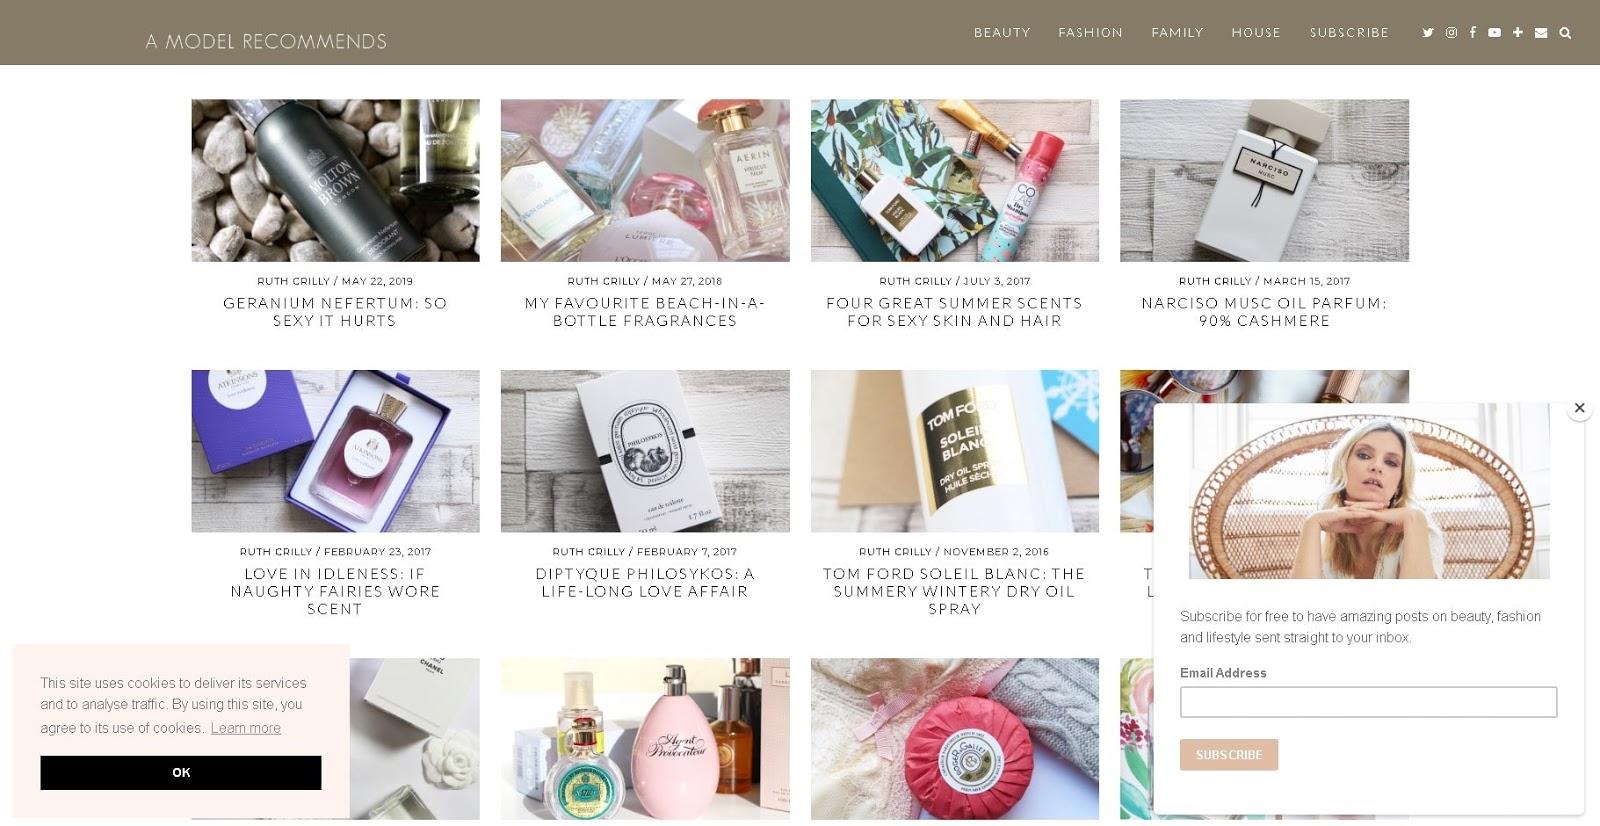 kak-nachat-beauty-blog-sajt-amodelrecommendscom-skrinshot